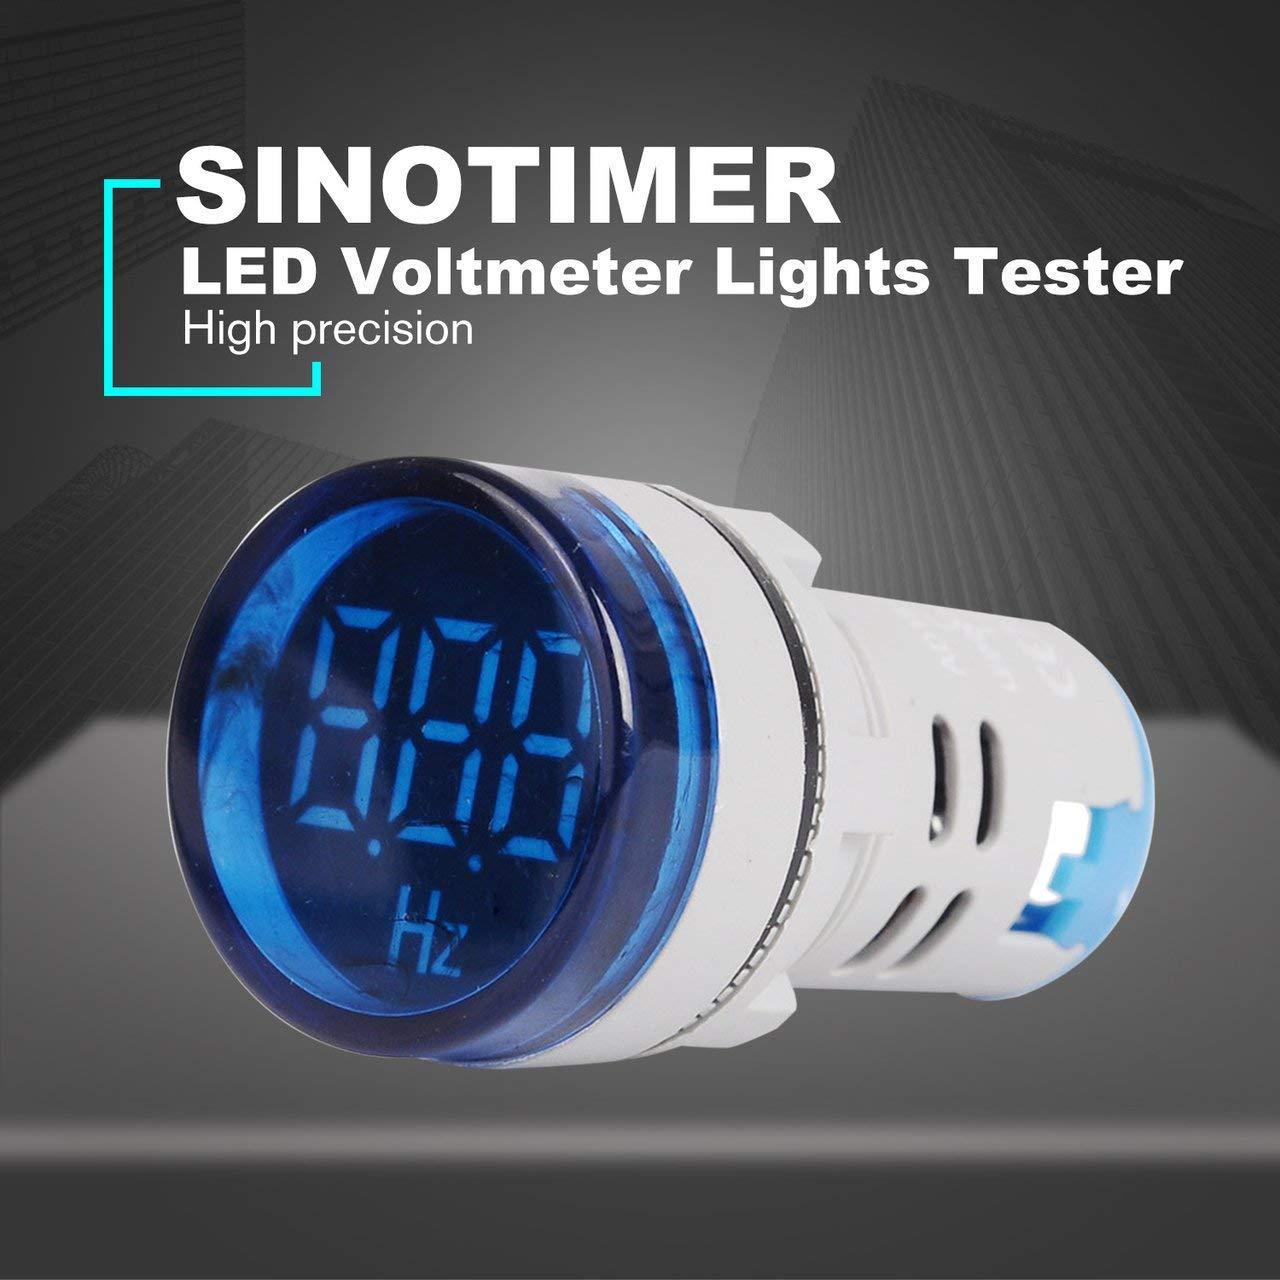 SINOTIMER ST16HZ-03 Voltmeter Lights Tester Signal Lamp Lights Tester 20-75Hz